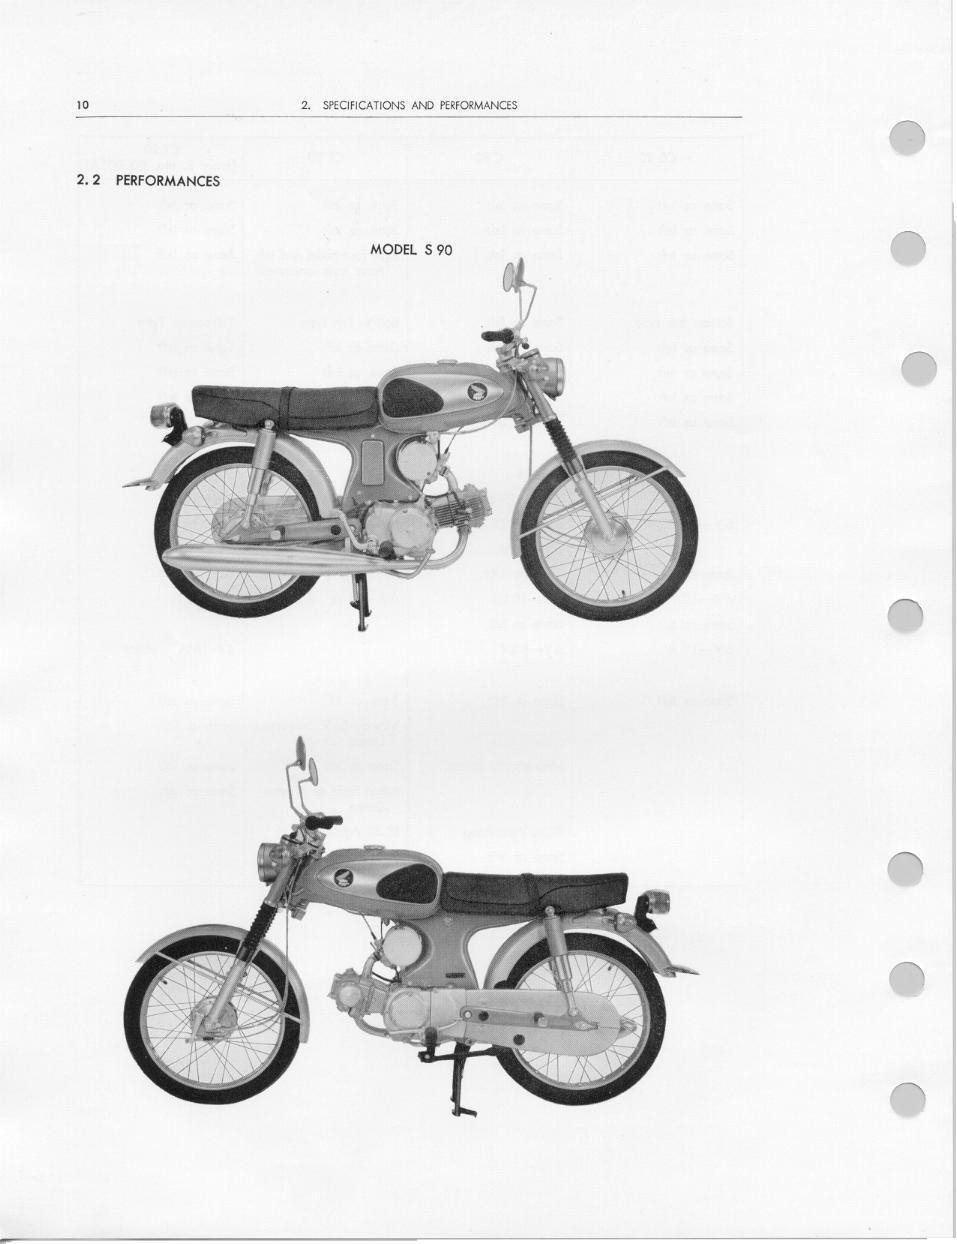 Honda C90: 017.jpg